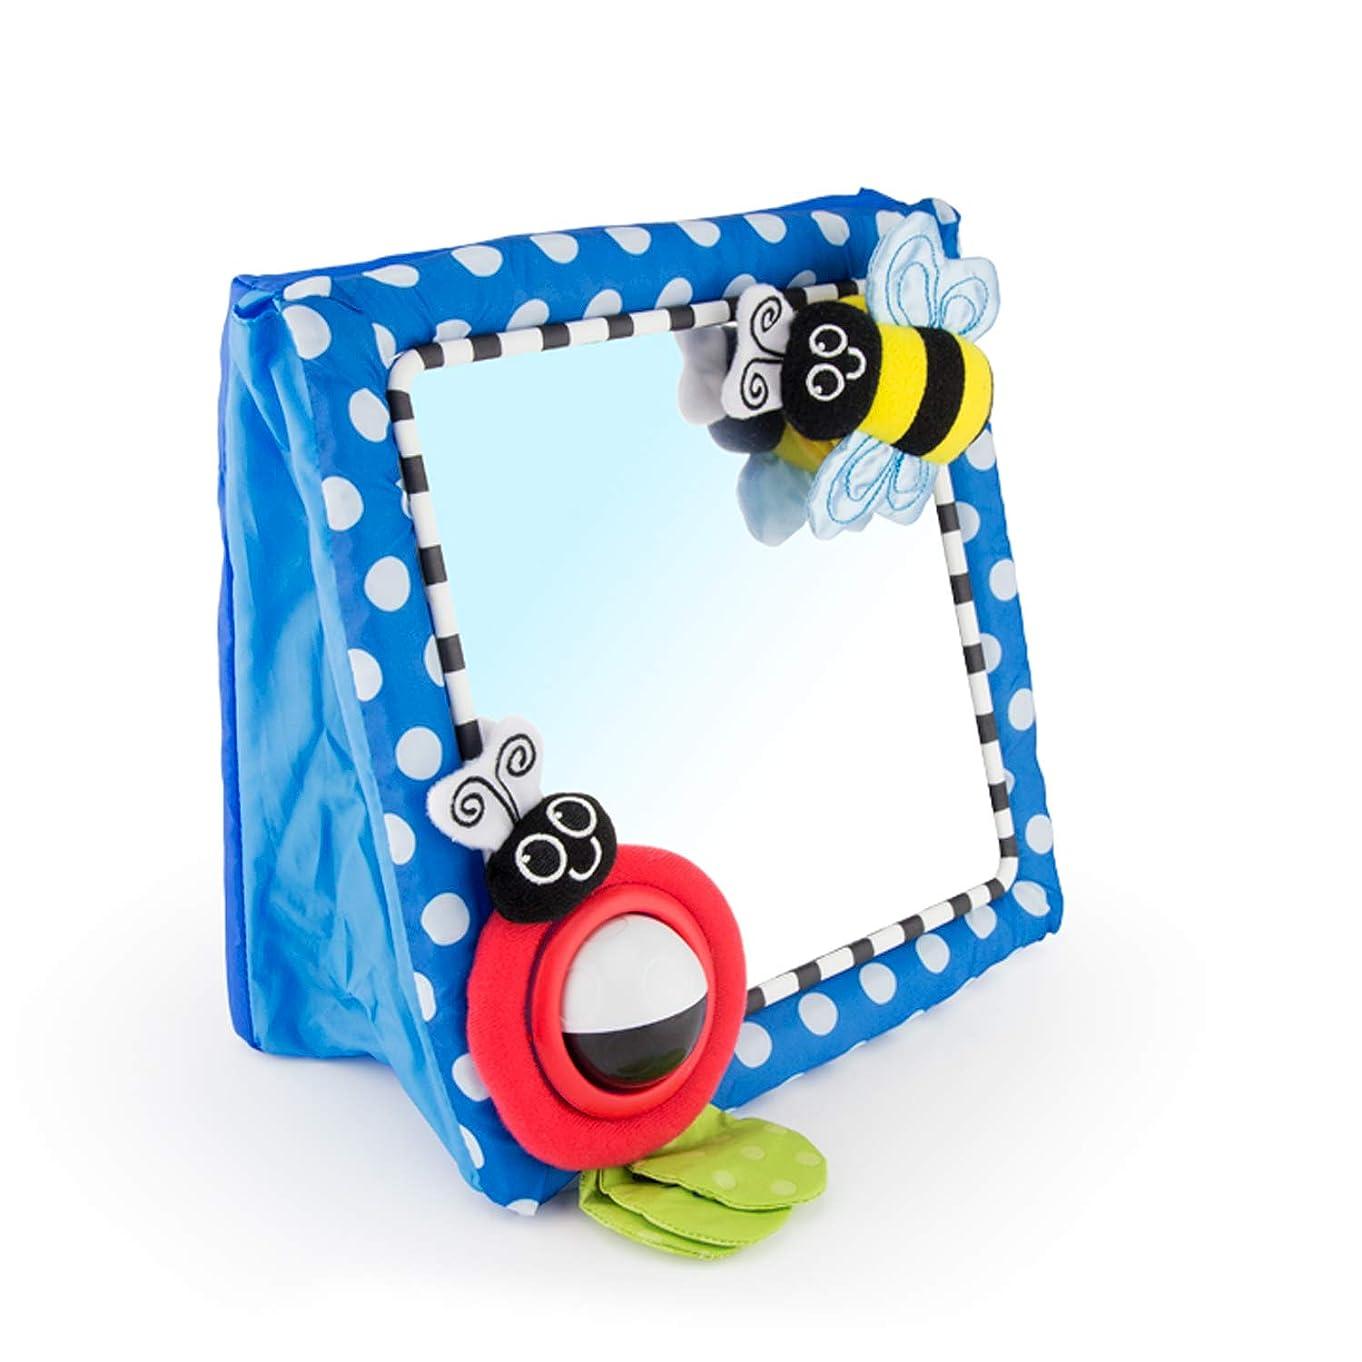 Sassy Tummy Time Floor Mirror  |  Developmental Baby Toy  | Newborn Essential for Tummy Time  |  Great Shower Gift